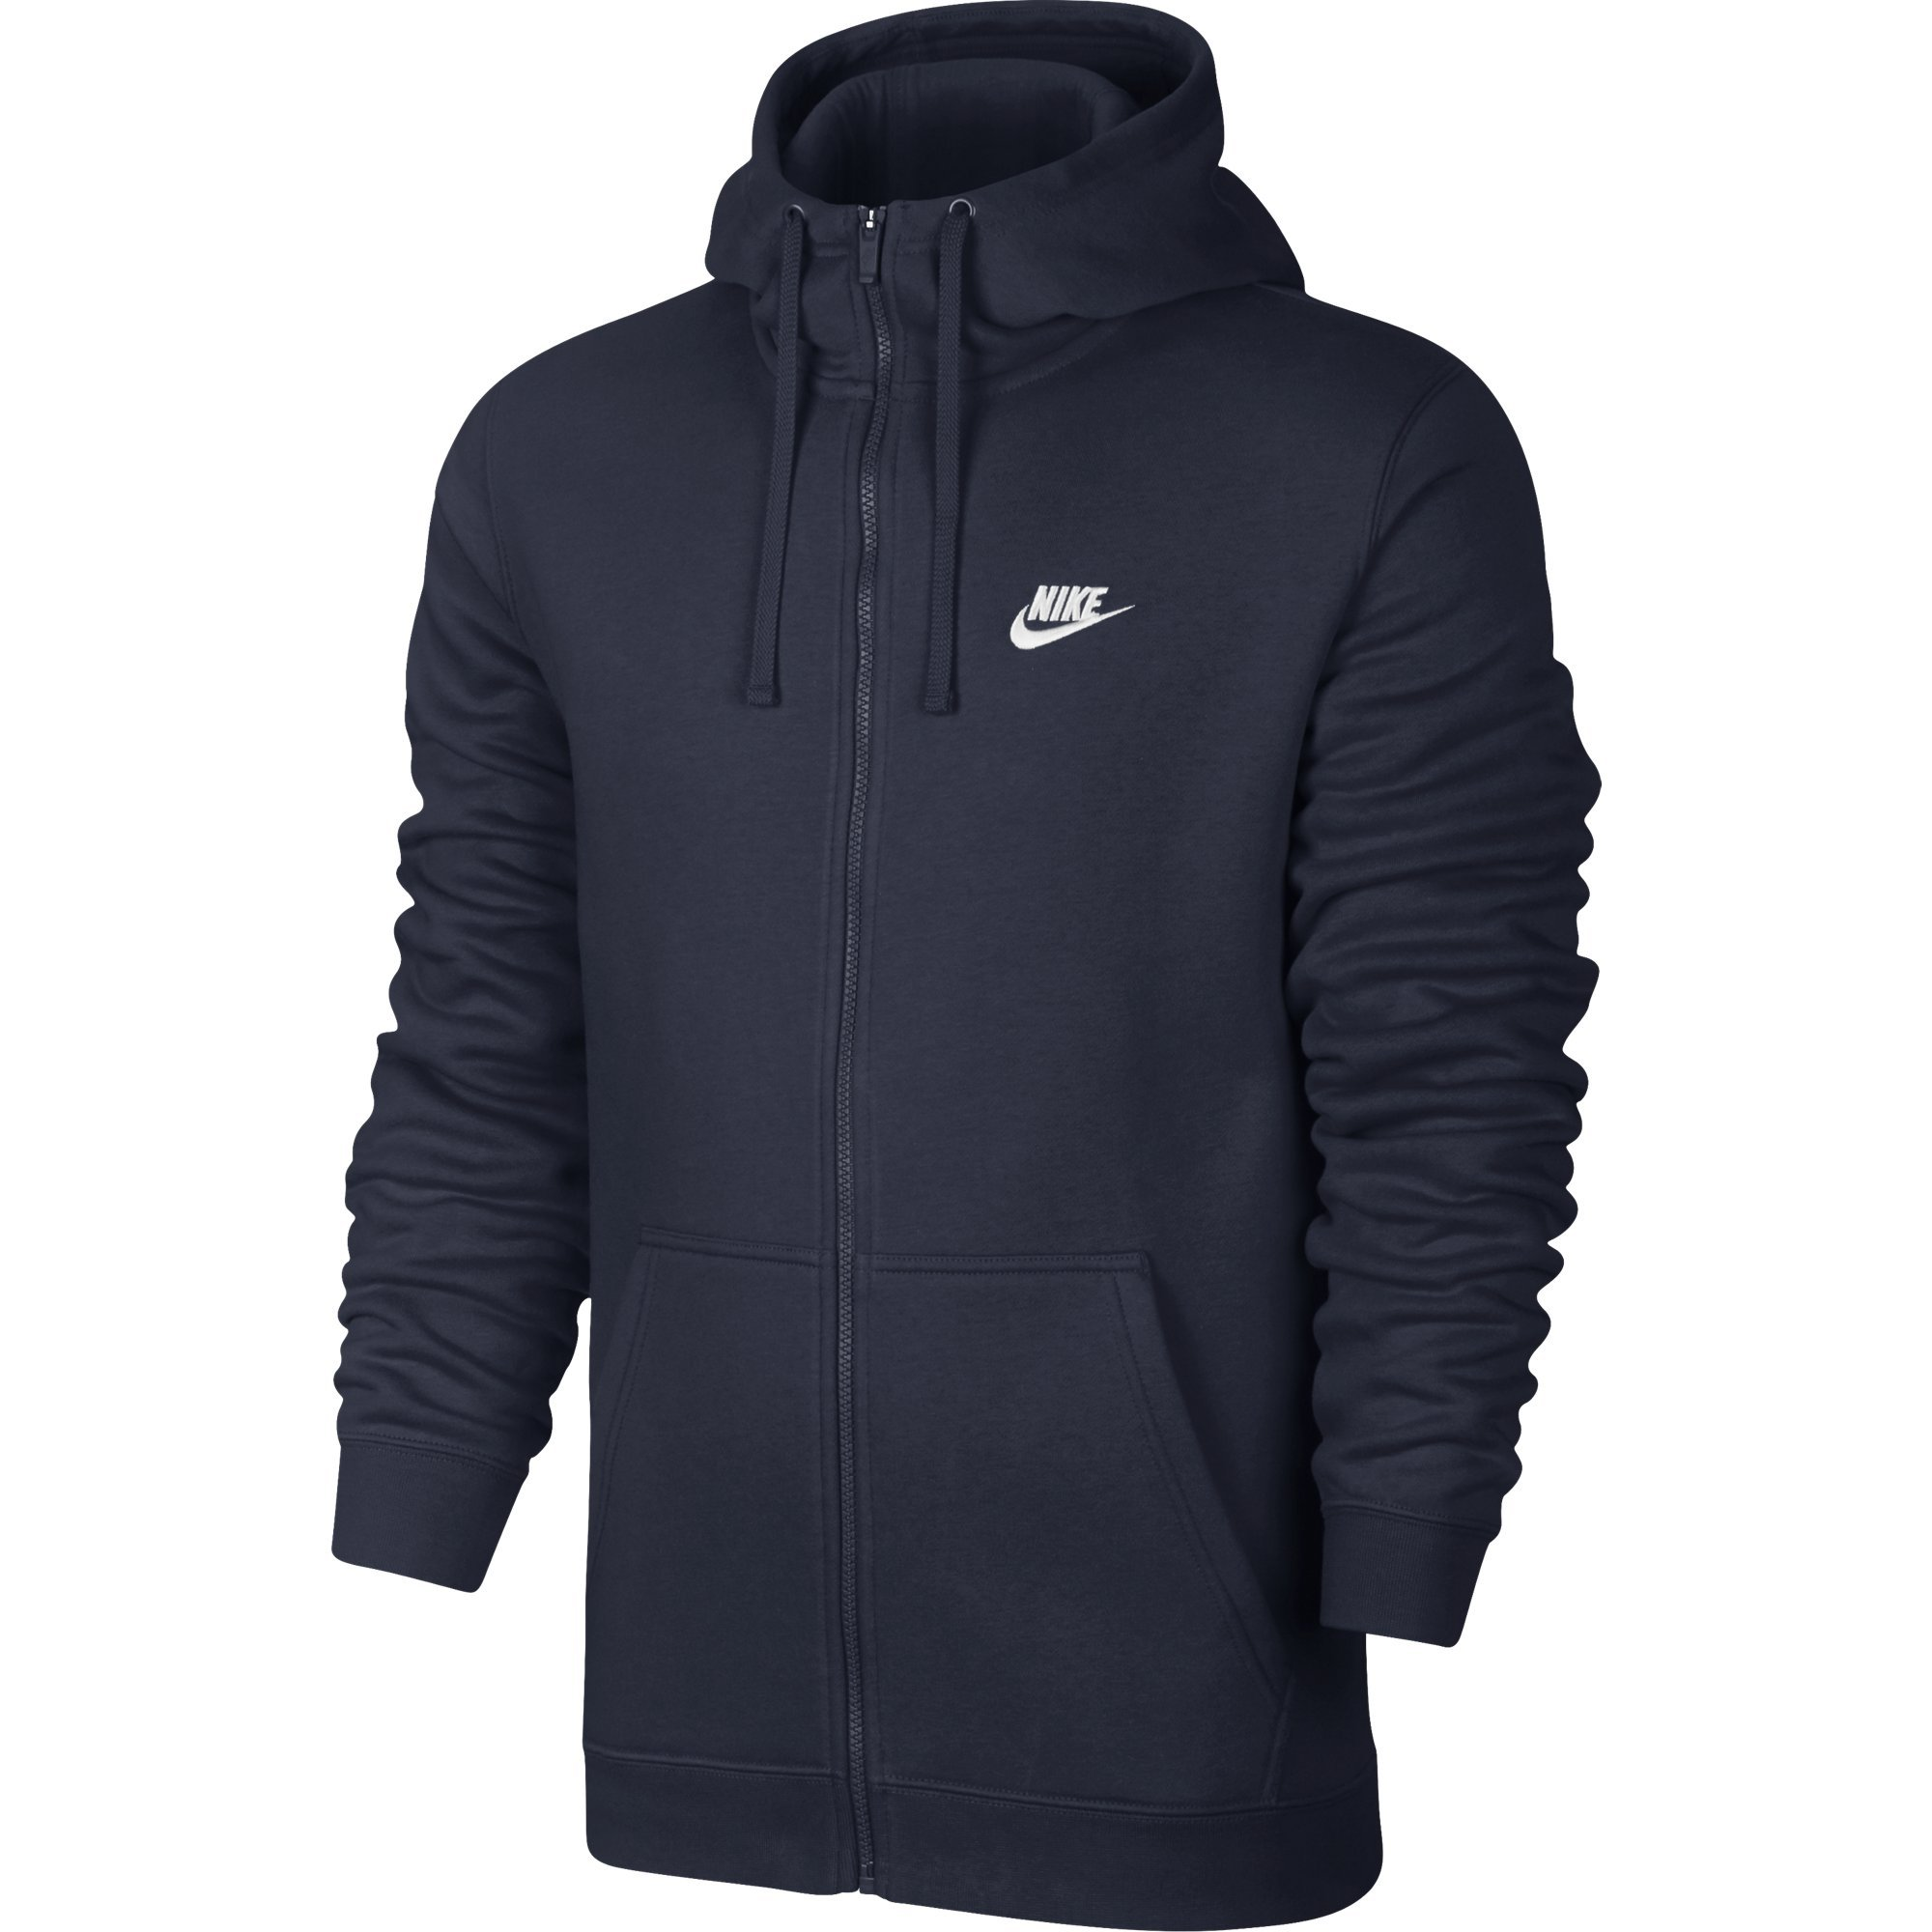 17b23de138a1 Nike M NSW HOODIE FZ FLC CLUB, Felpa Con Cappuccio Uomo, Blu Ossidiana/